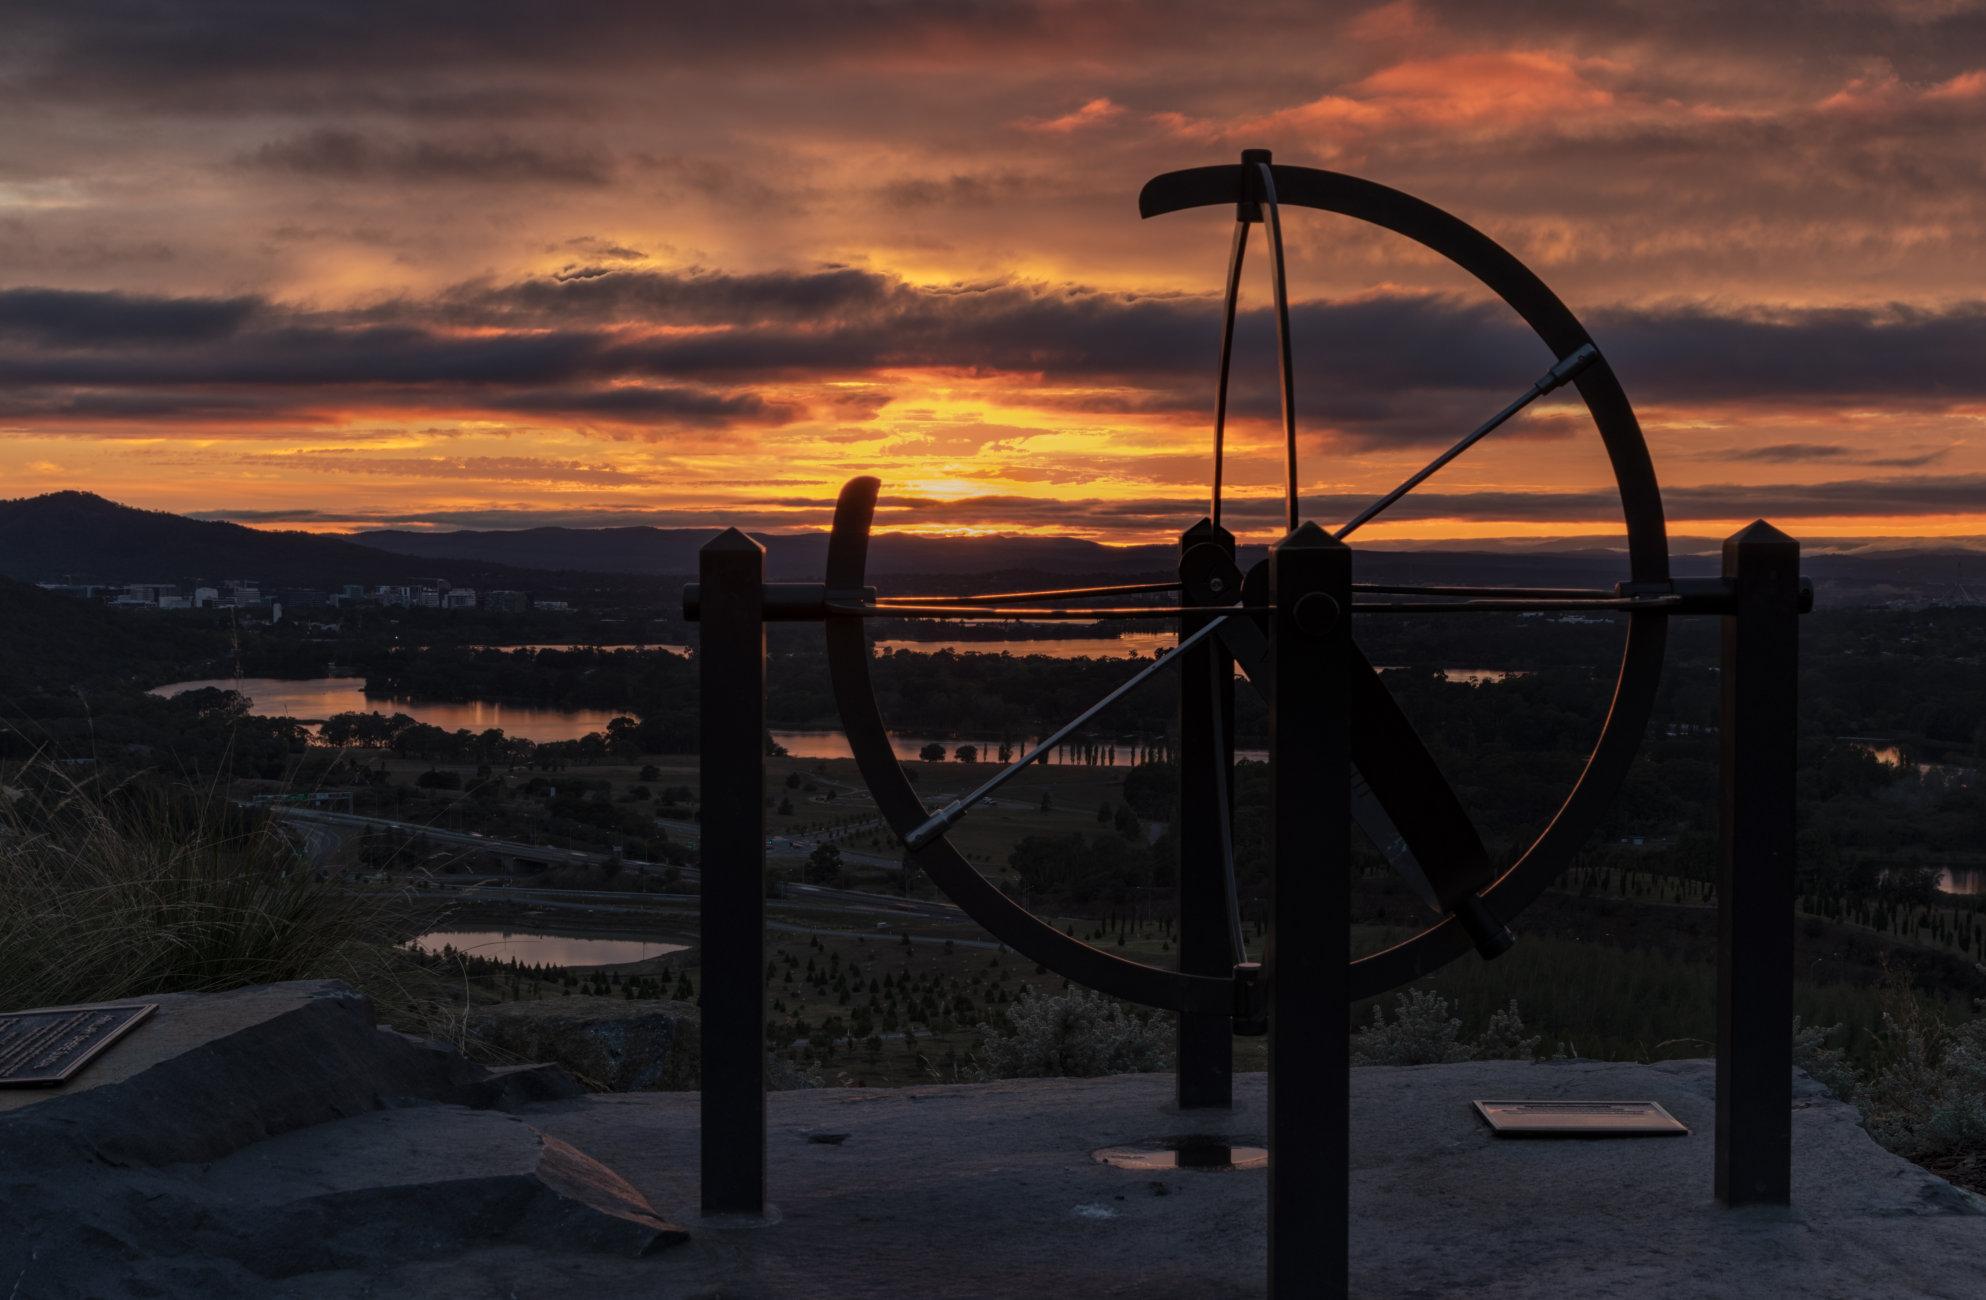 Armillary Sphere, National Arboretum, Canberra